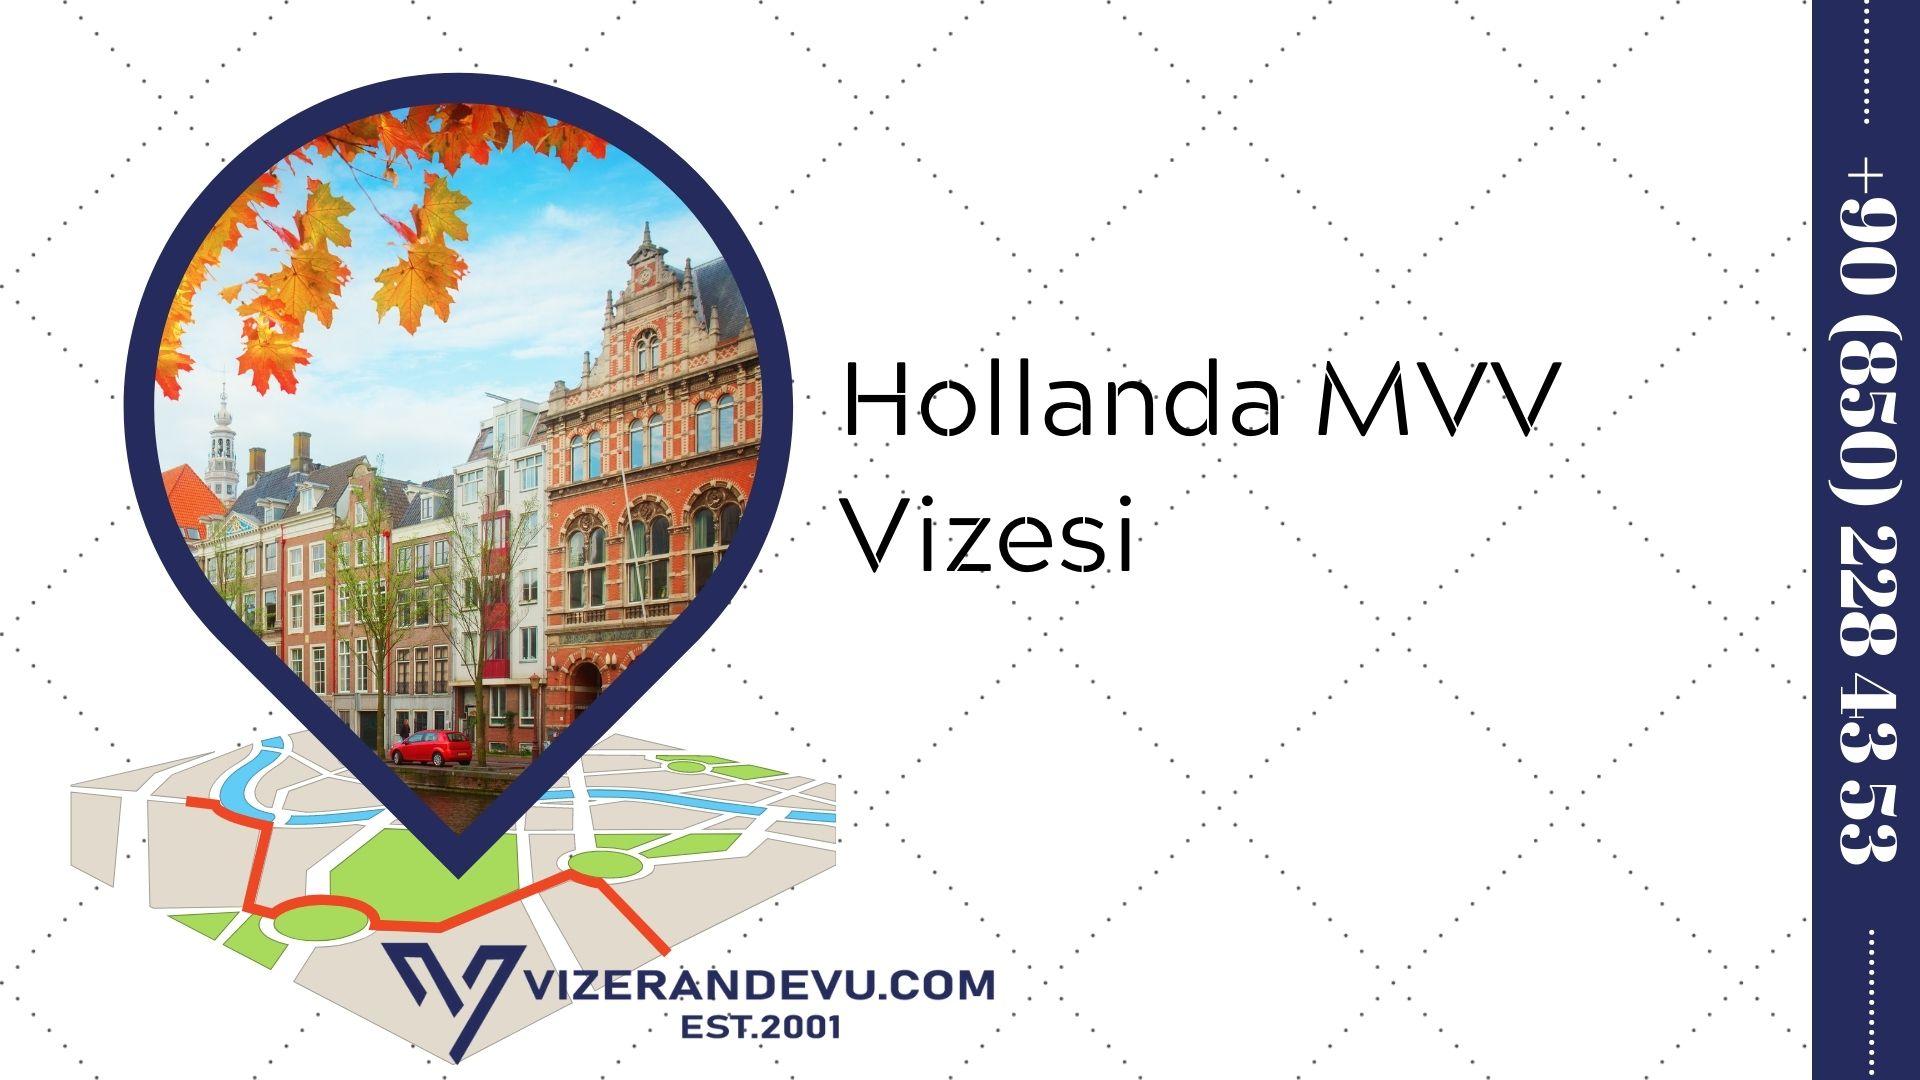 Hollanda MVV Vizesi